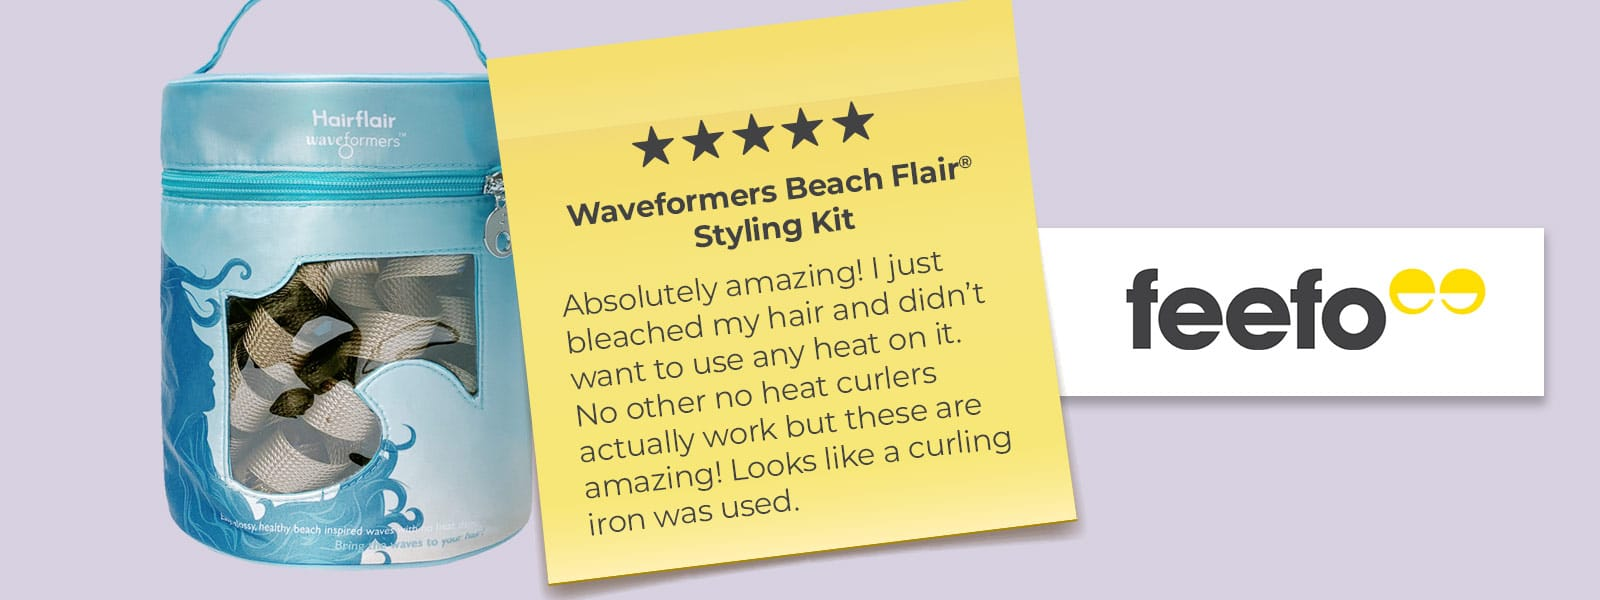 Waveformers Beach Flair Kit de peinado